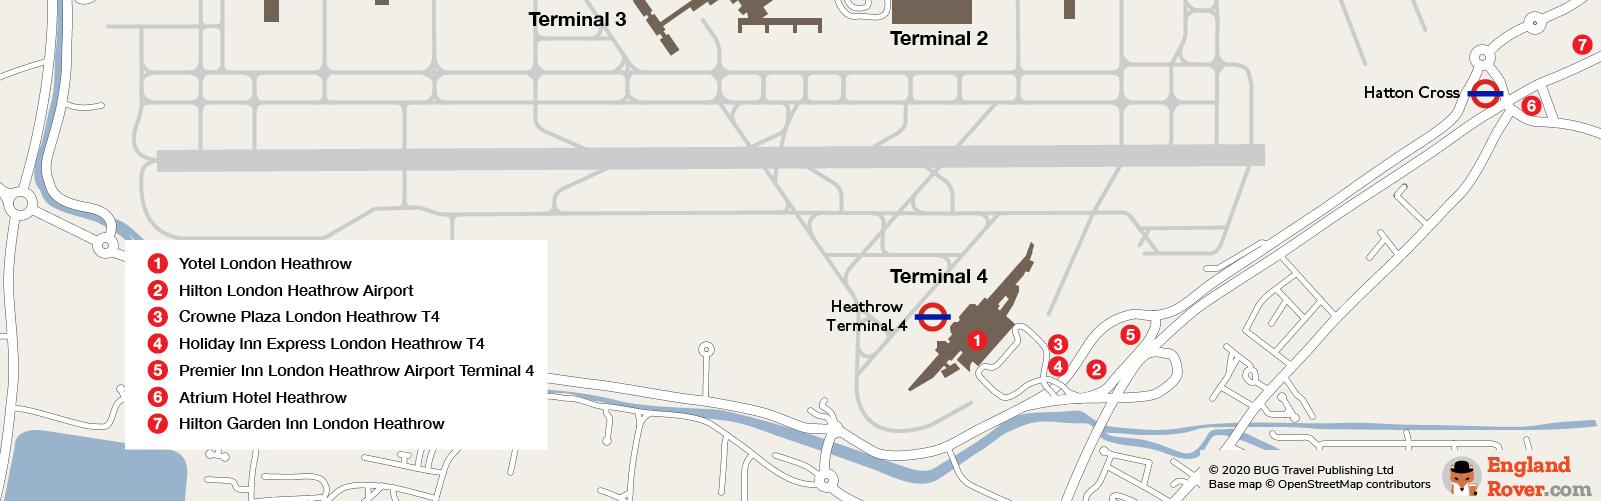 Heathrow Airport Terminal 4 hotels